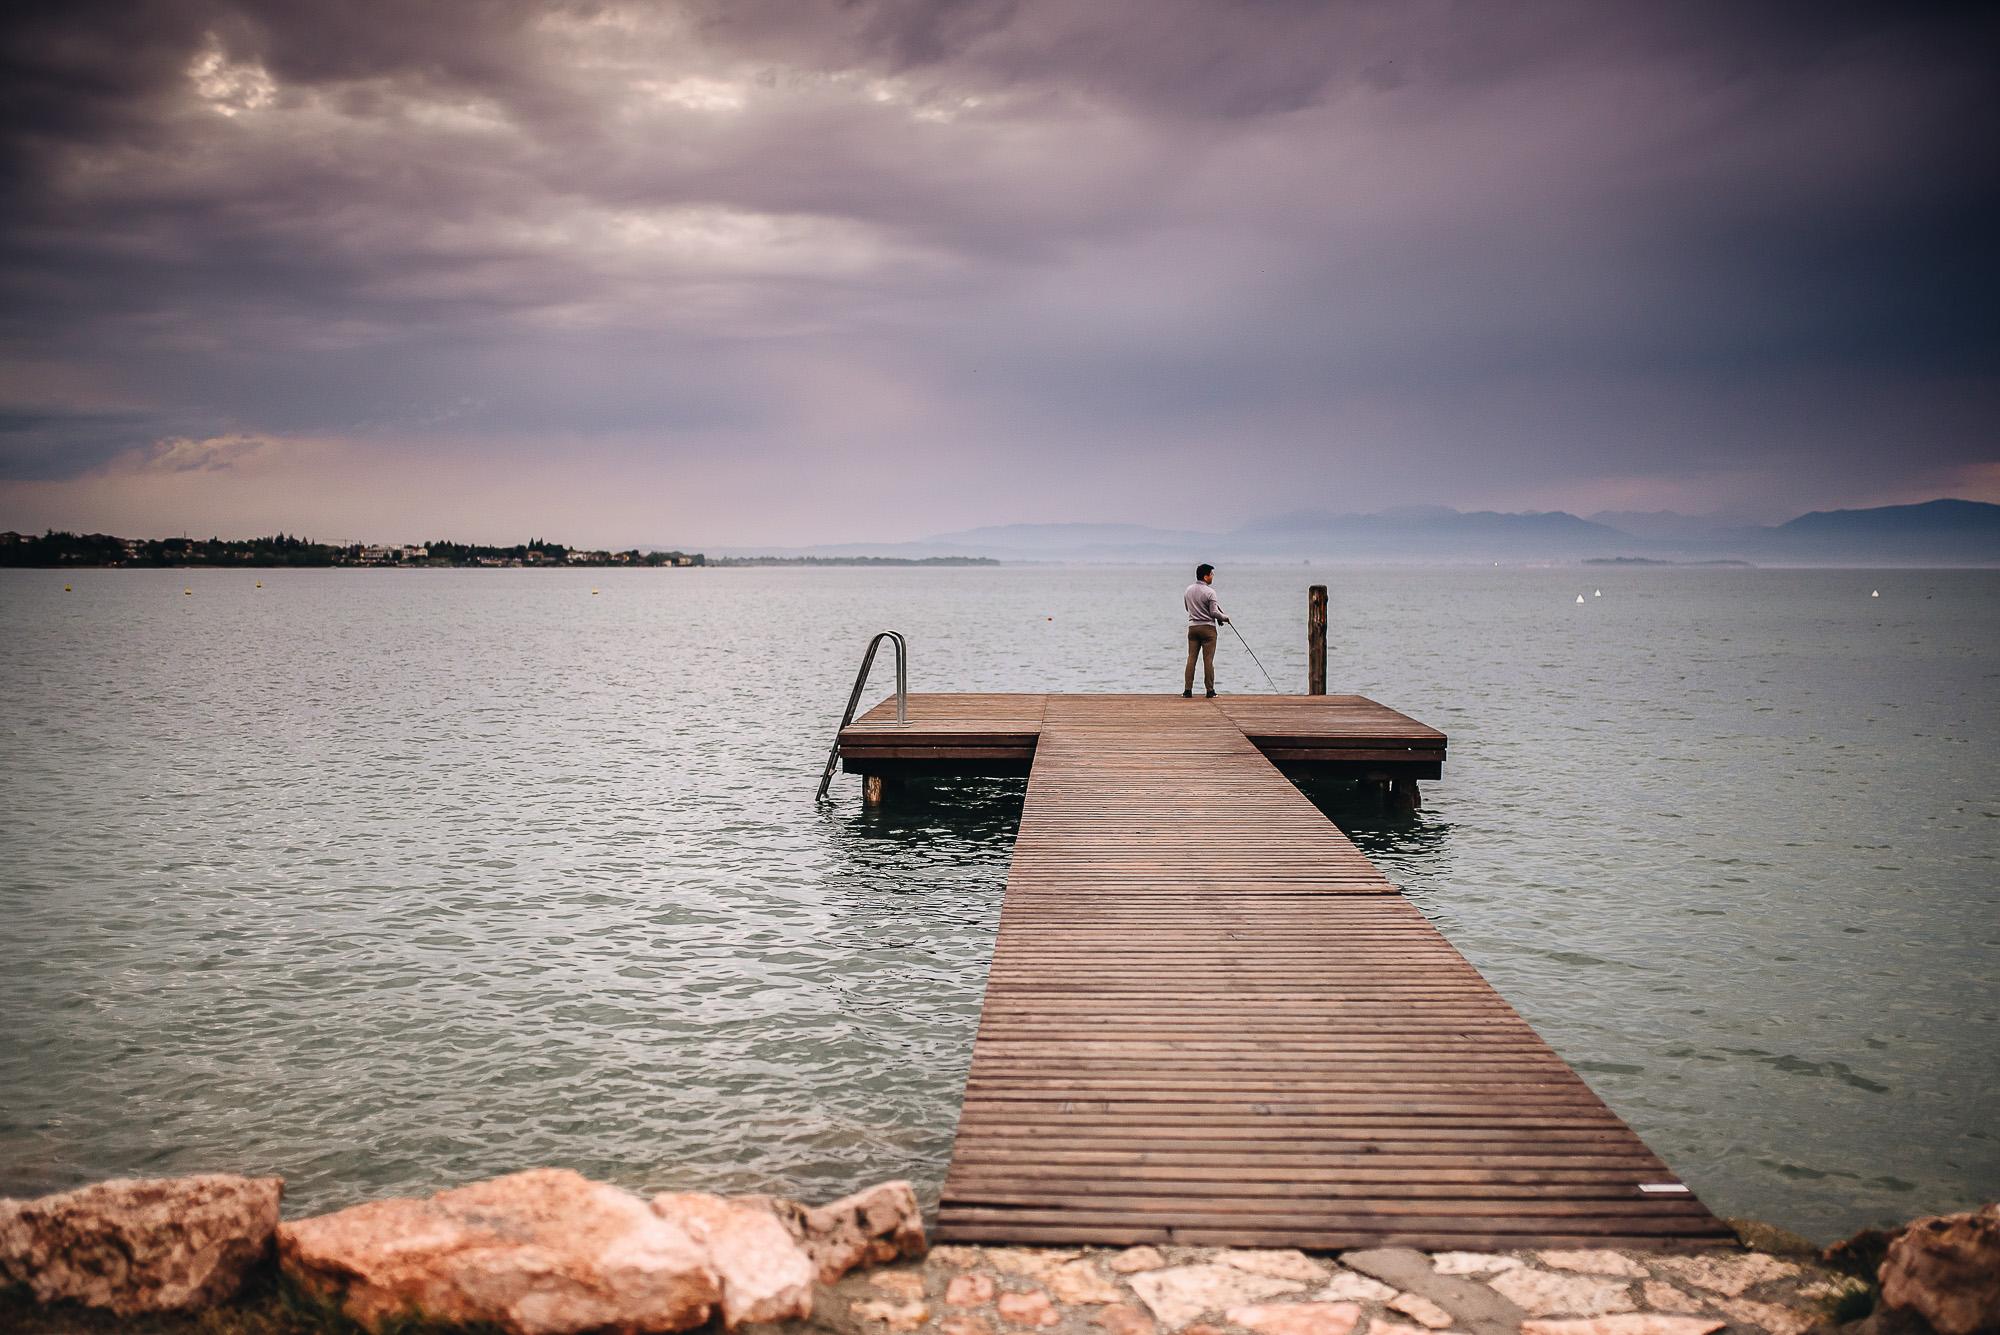 OurBeautifulAdventure-LakeGarda-Italy-Blog-2-4.jpg